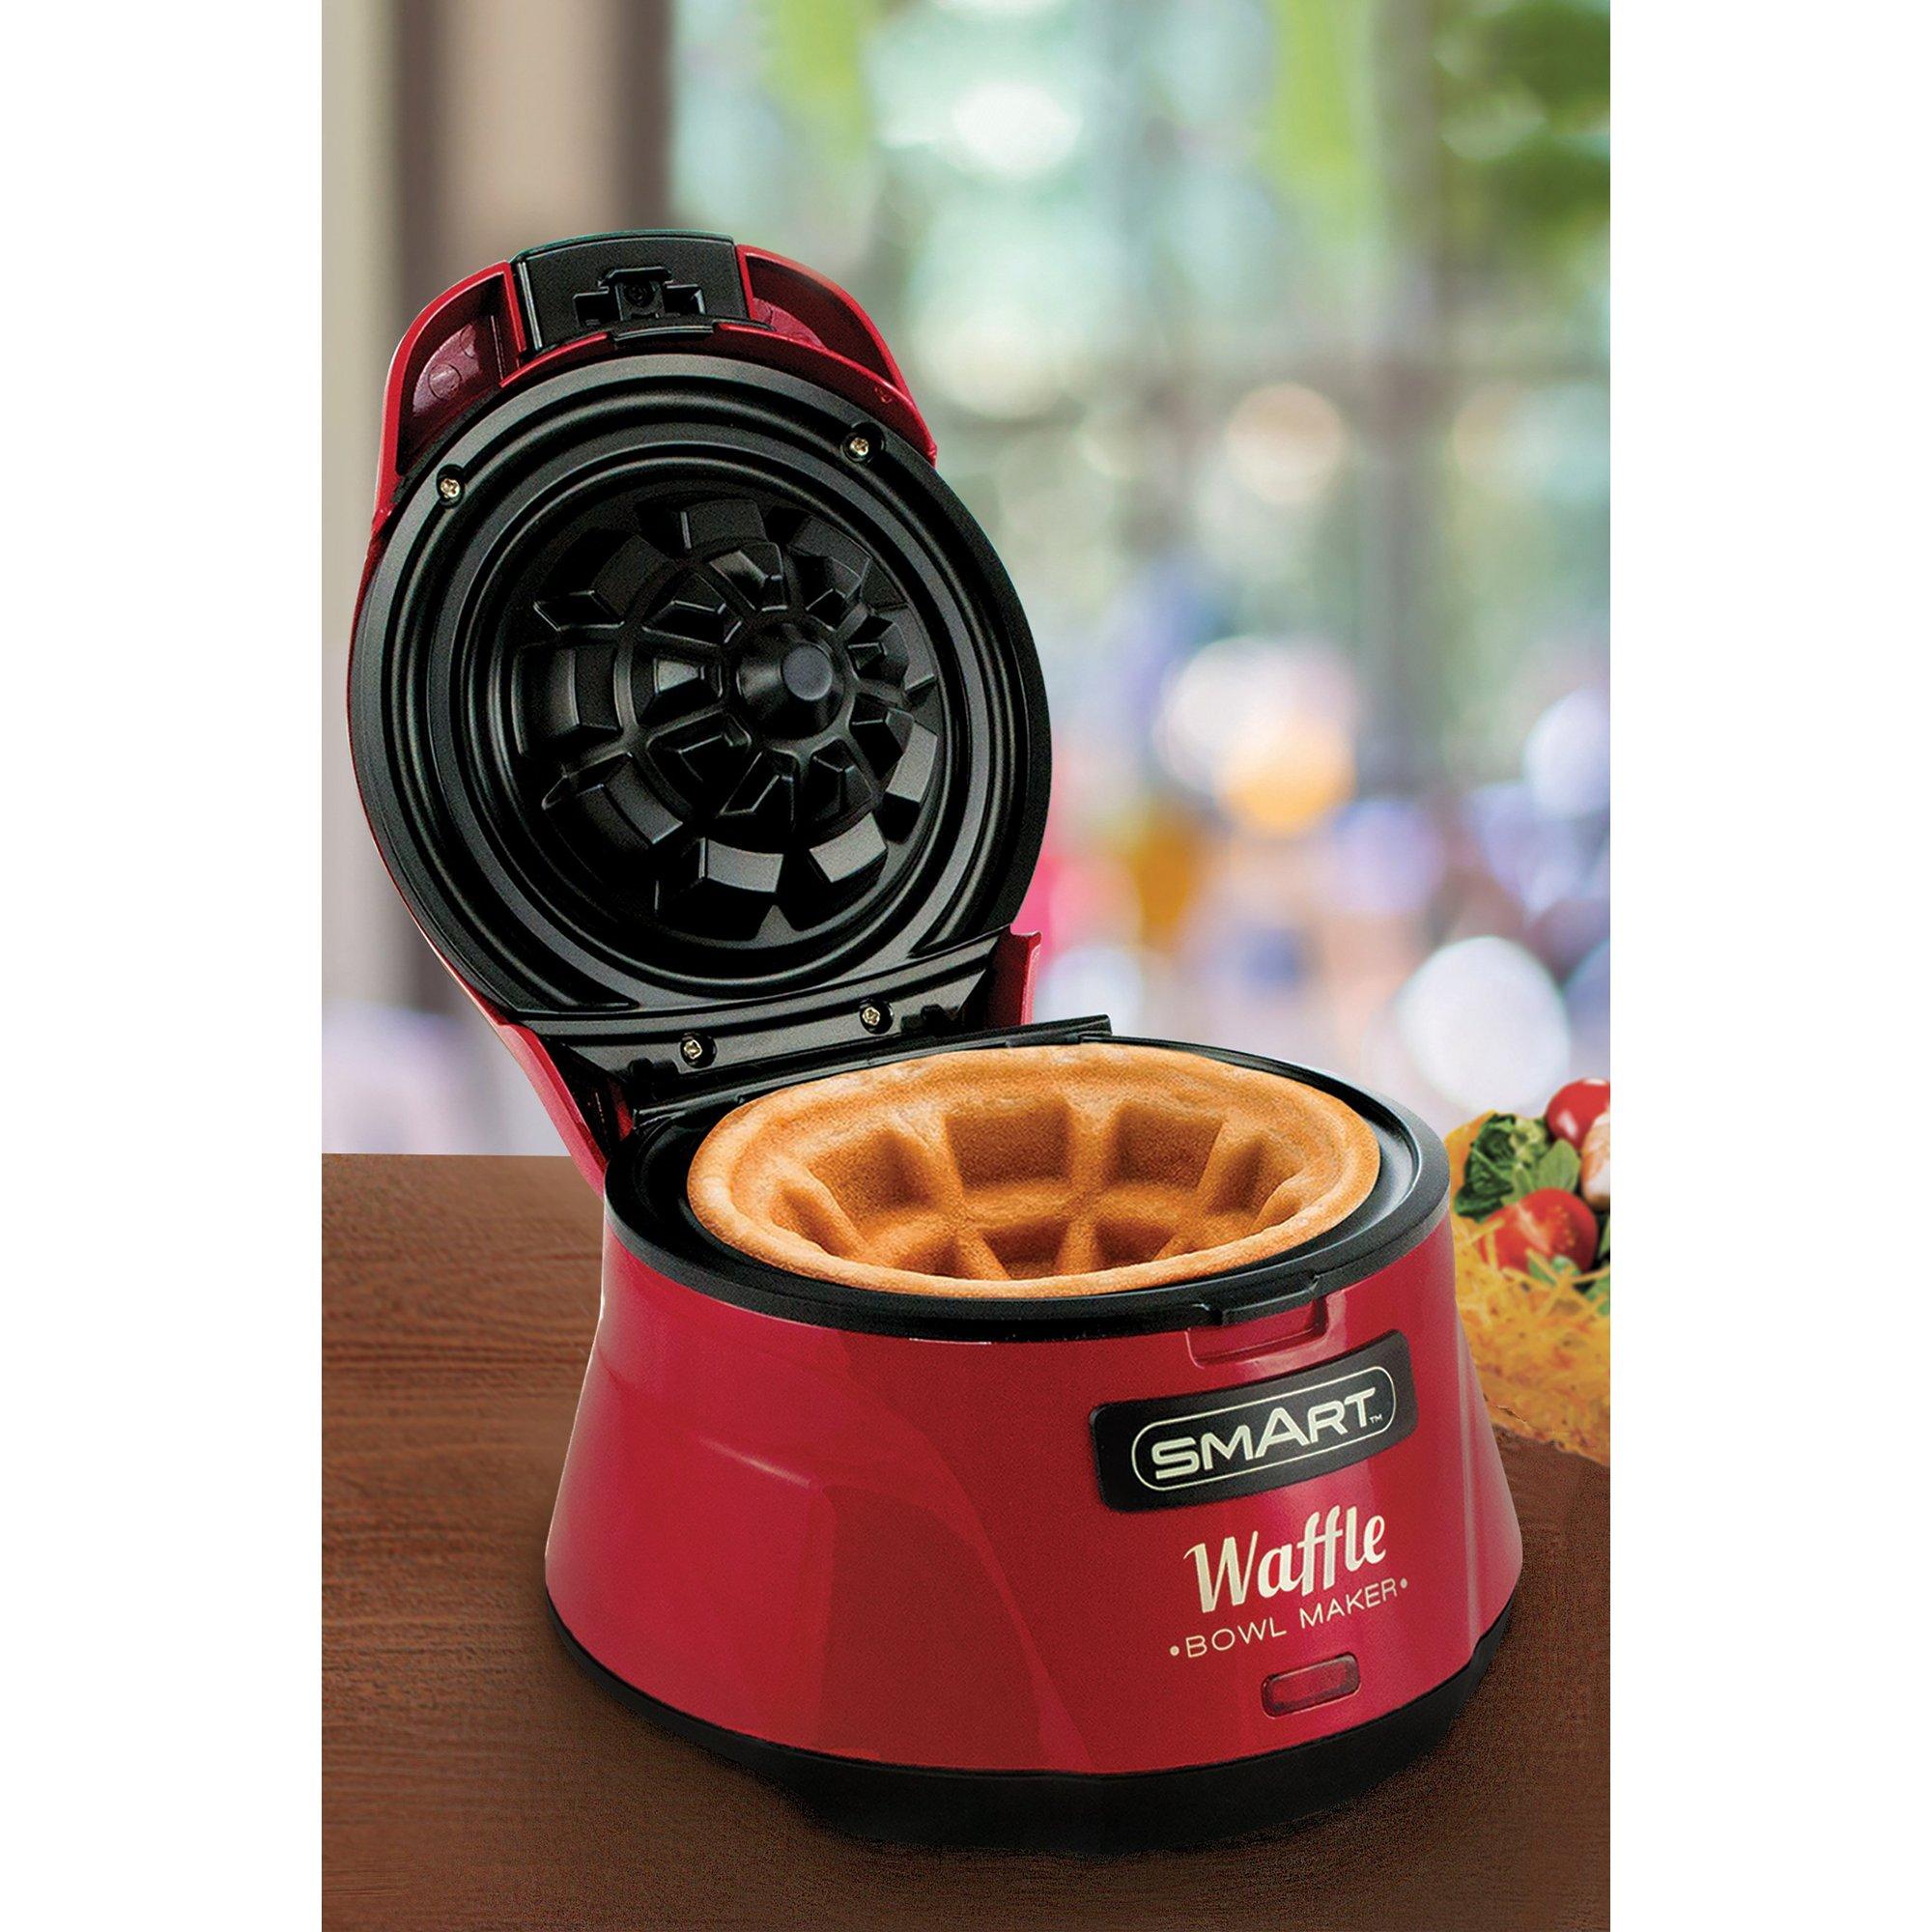 SMART Waffle Bowl